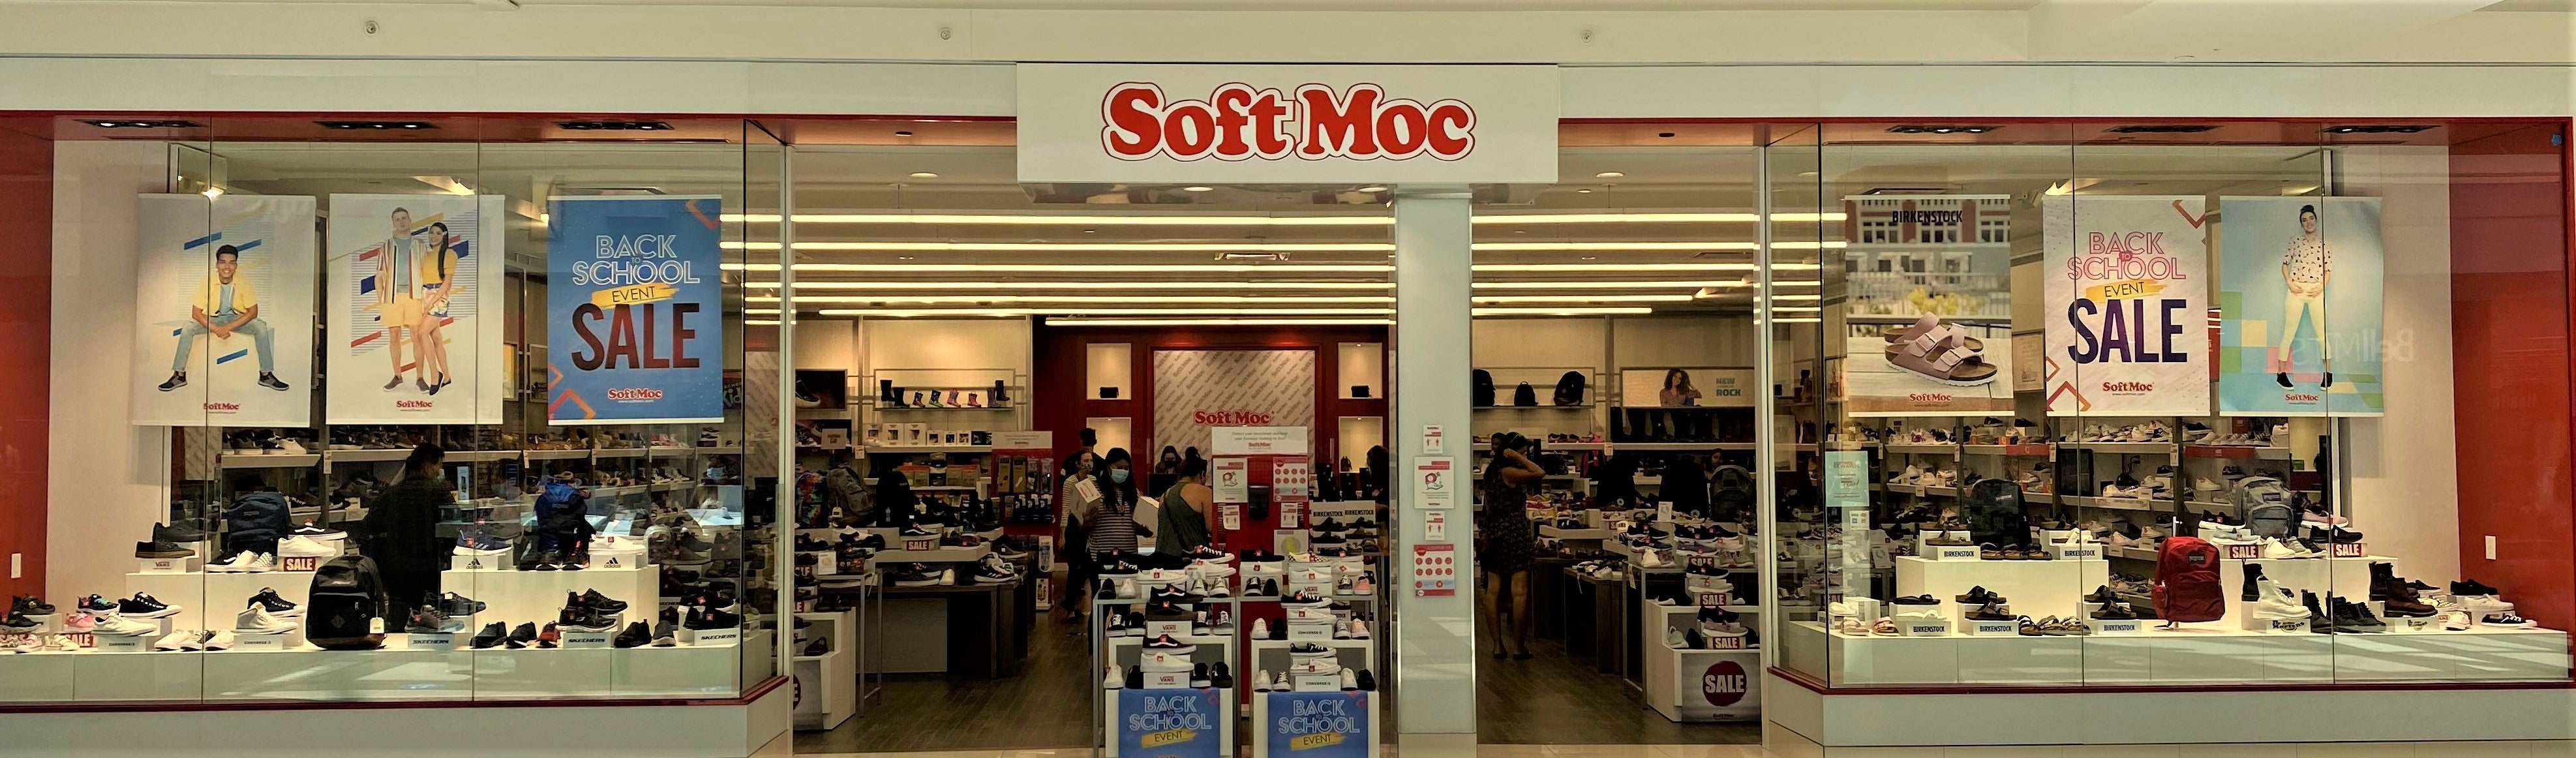 SoftMoc Polo Park Mall